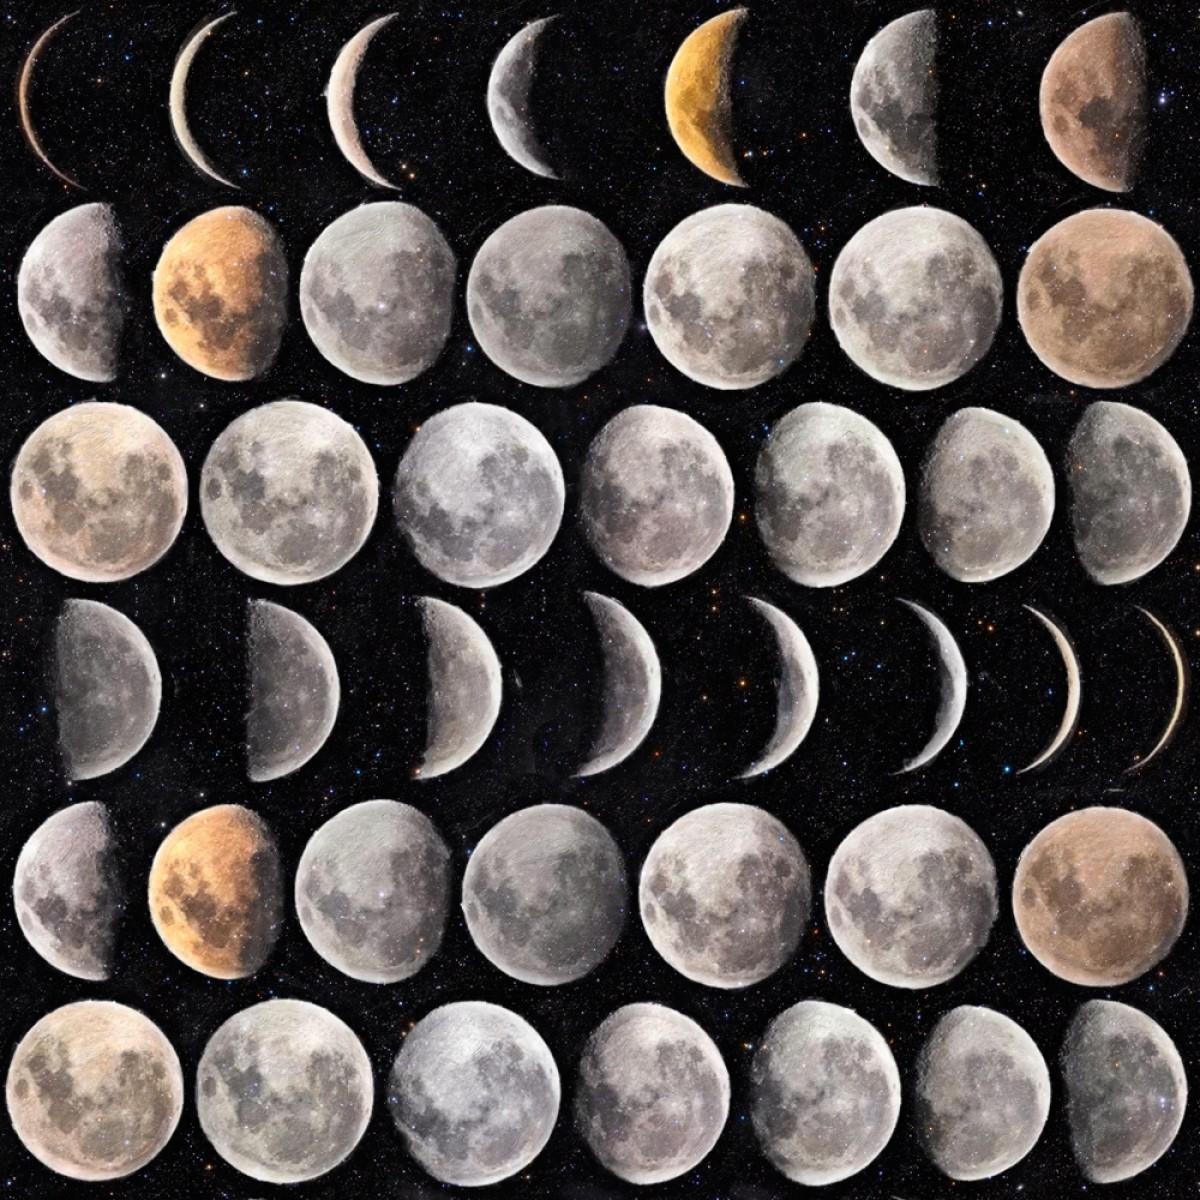 Tapet designer Universe Moon Phases, MINDTHEGAP